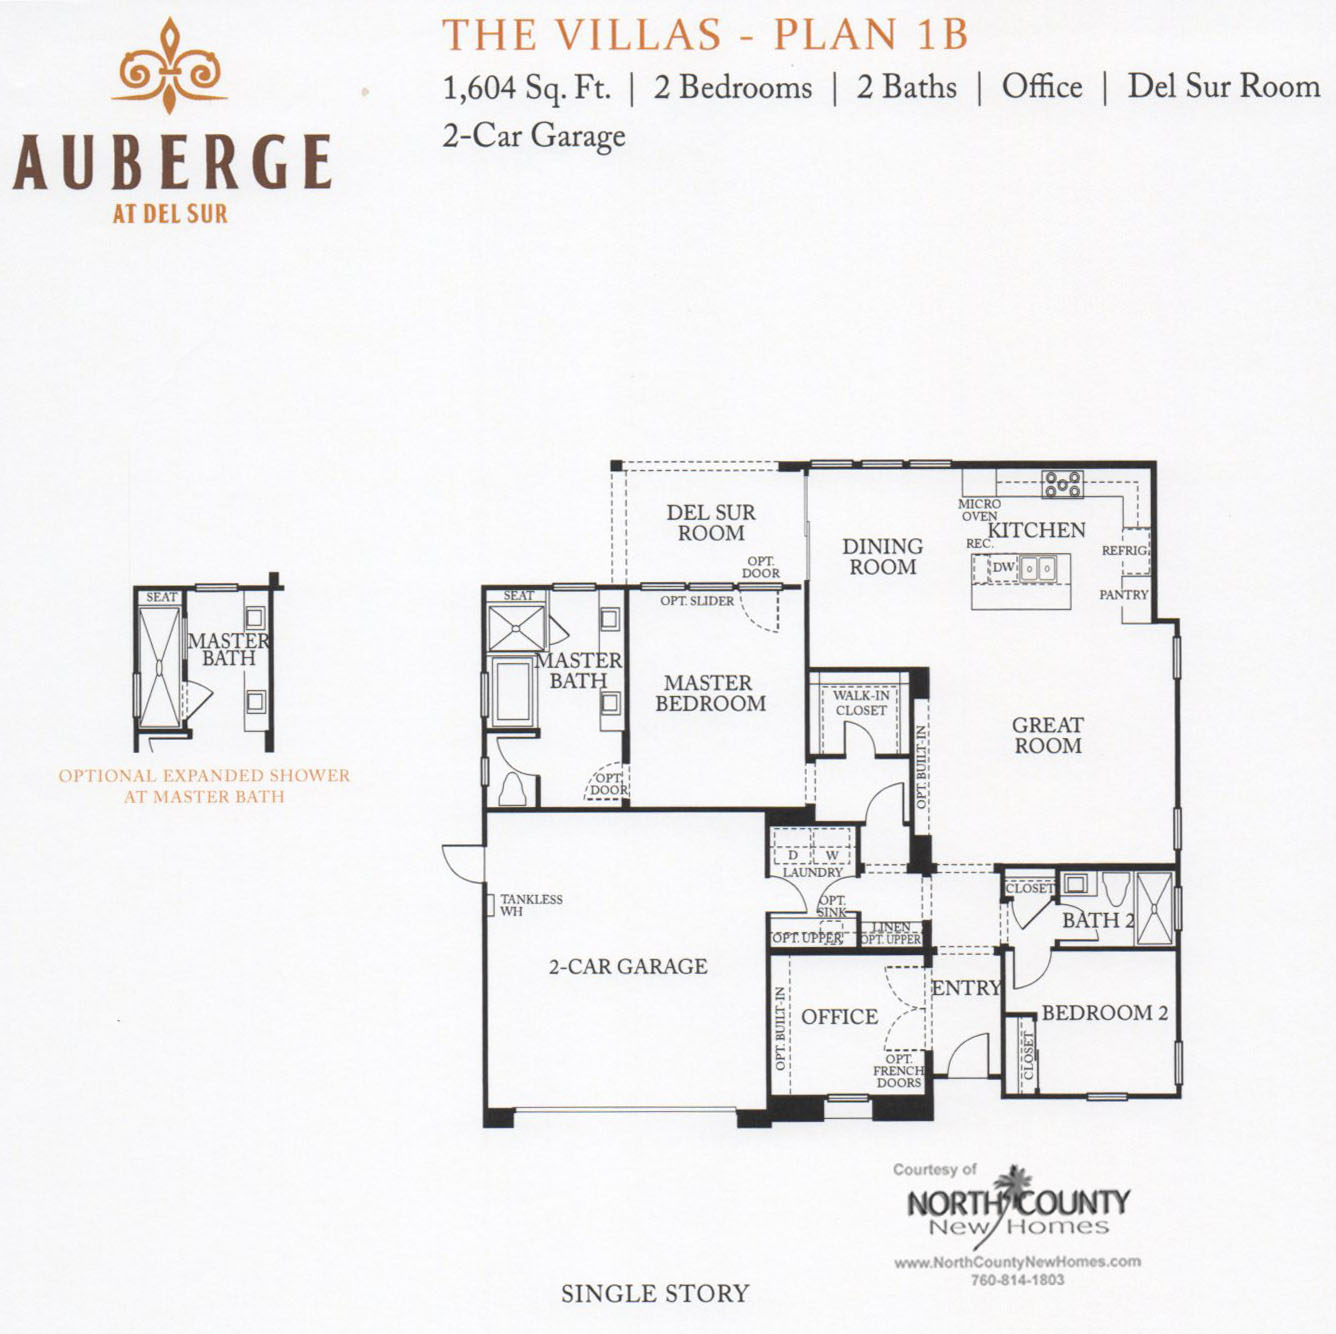 55+ New Homes | Auberge at Del Sur Villas Floor Plans